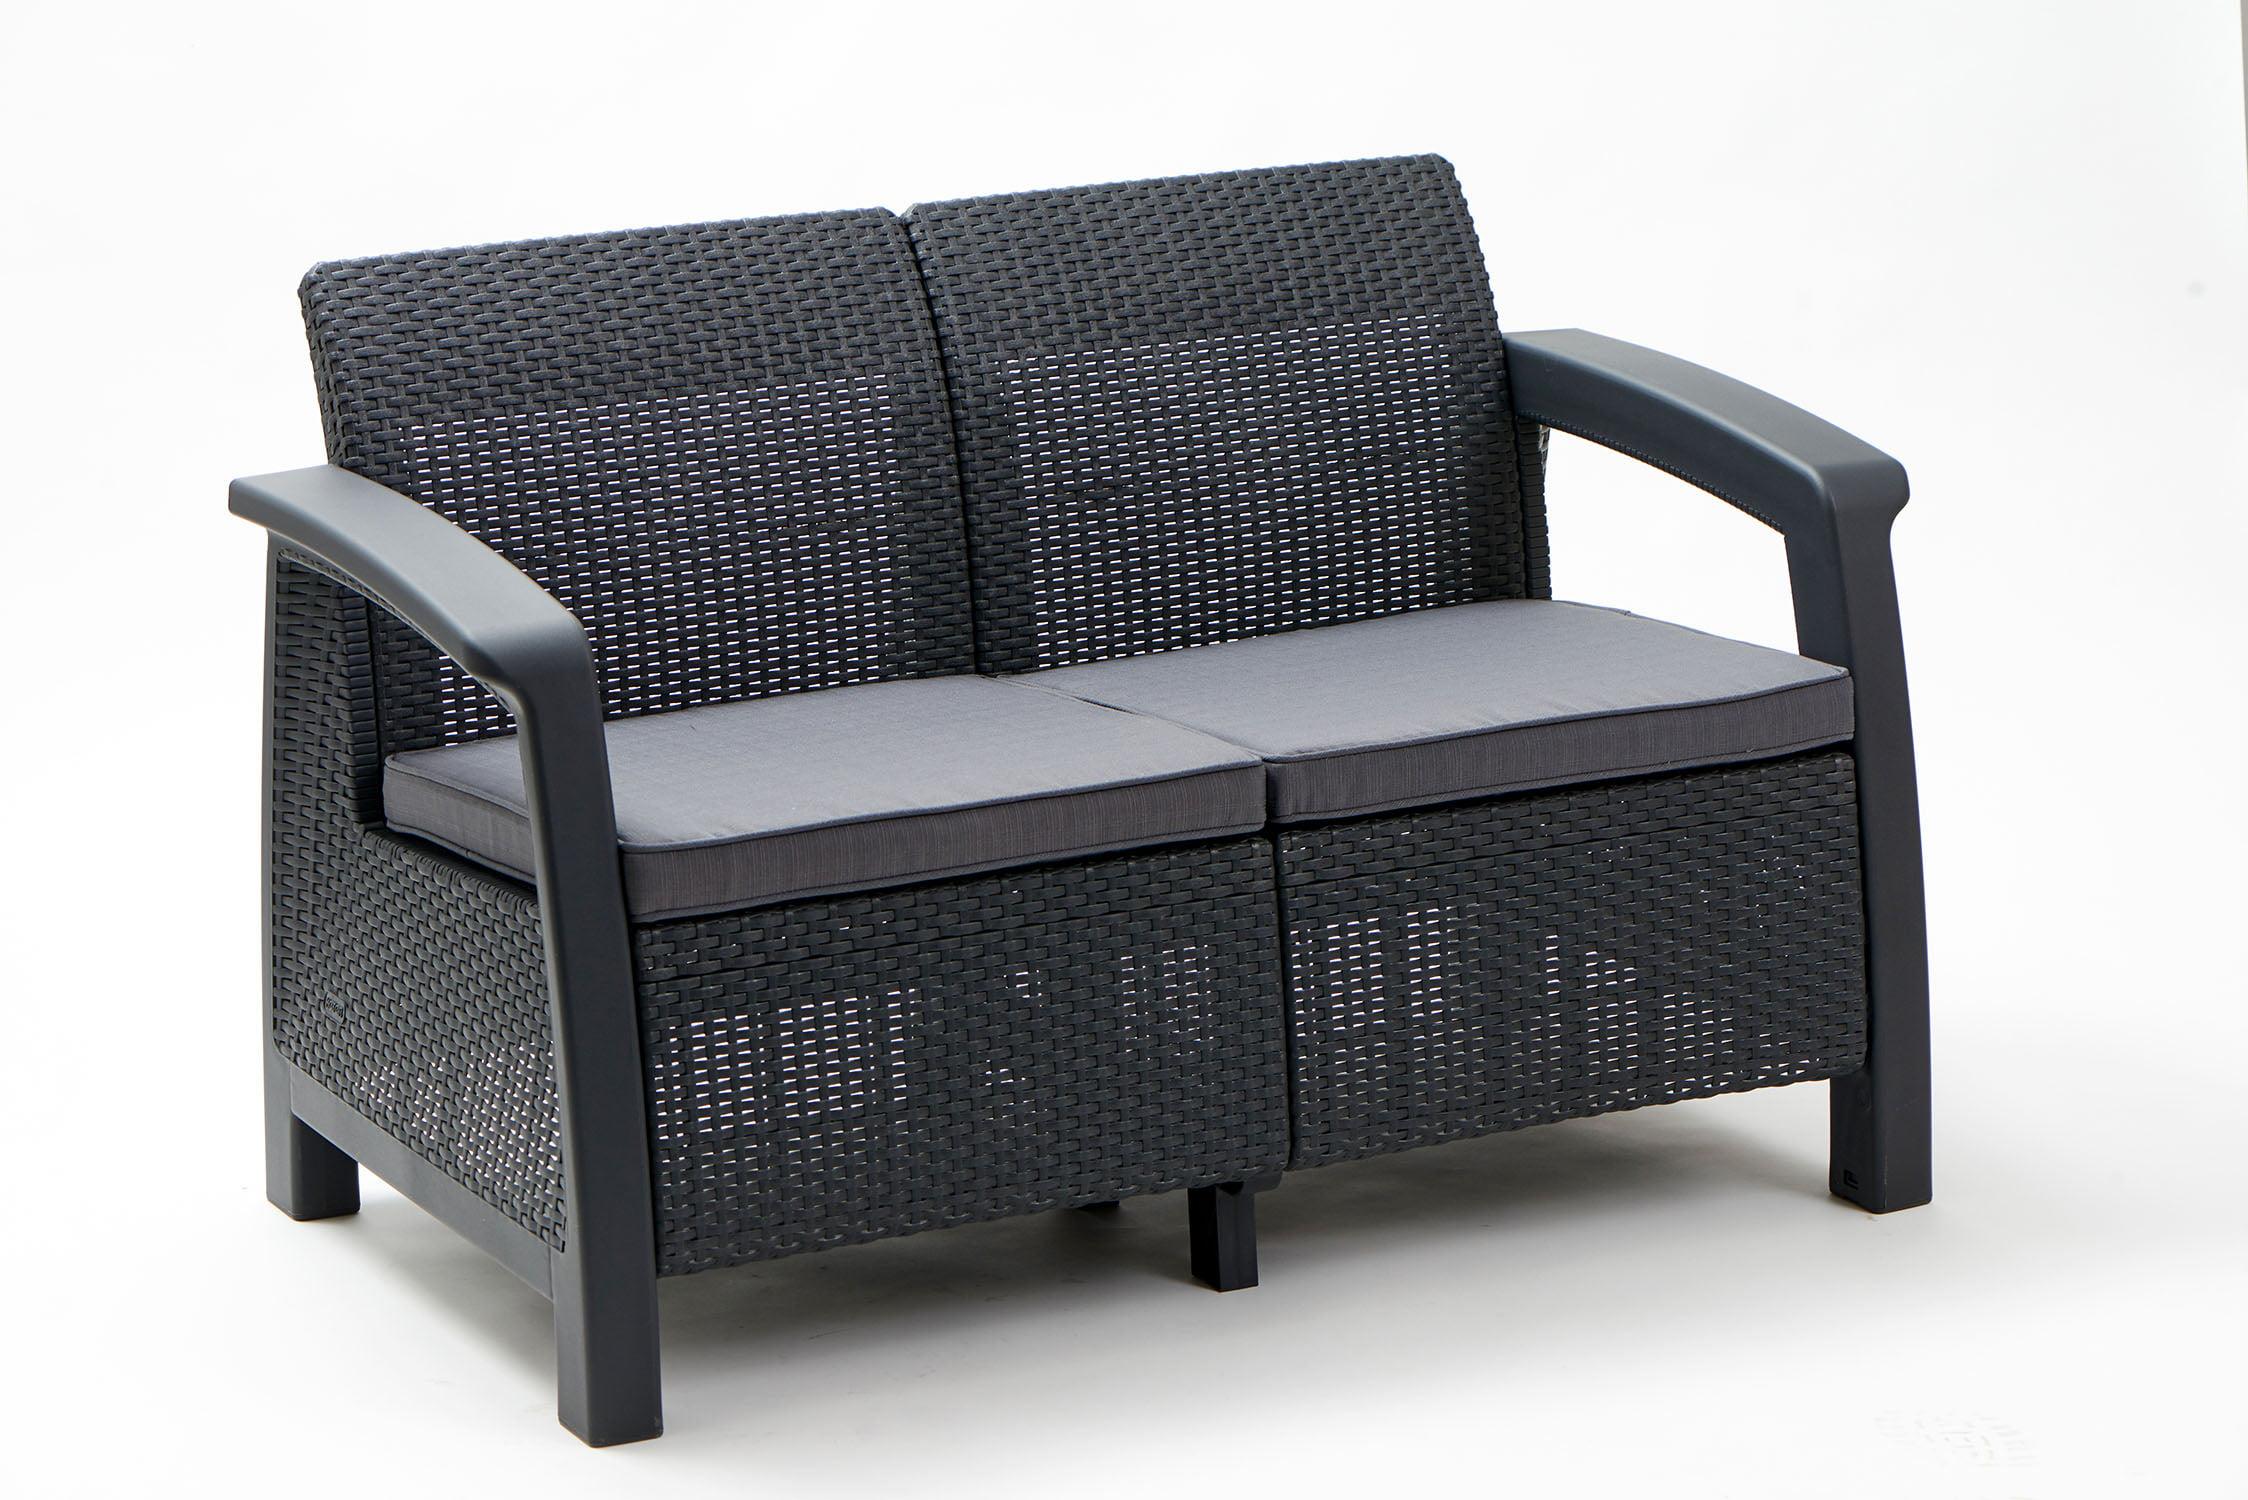 Keter bahamas loveseat resin outdoor patio furniture brown walmart com